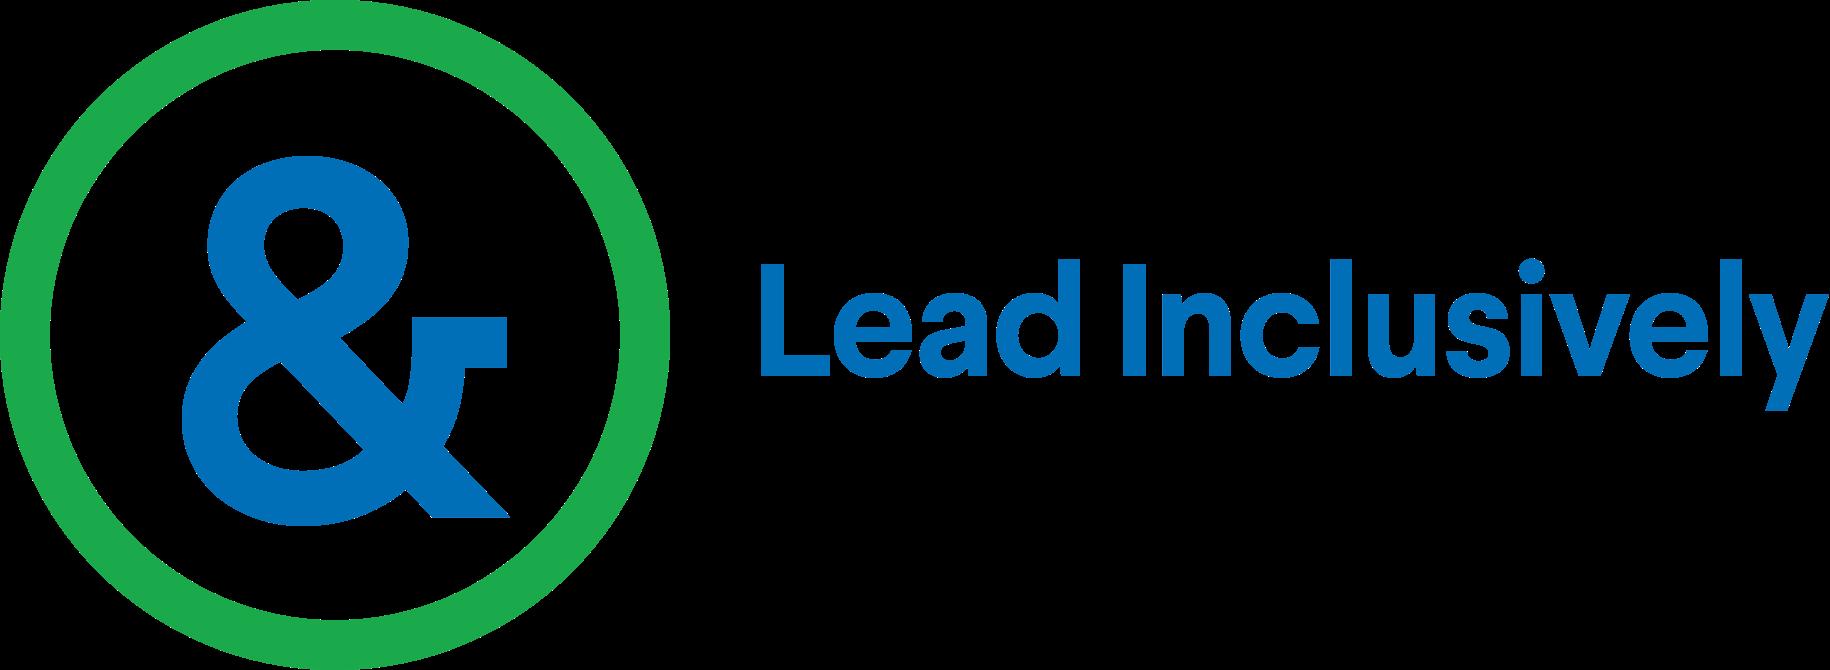 Lead Inclusively Inc logo